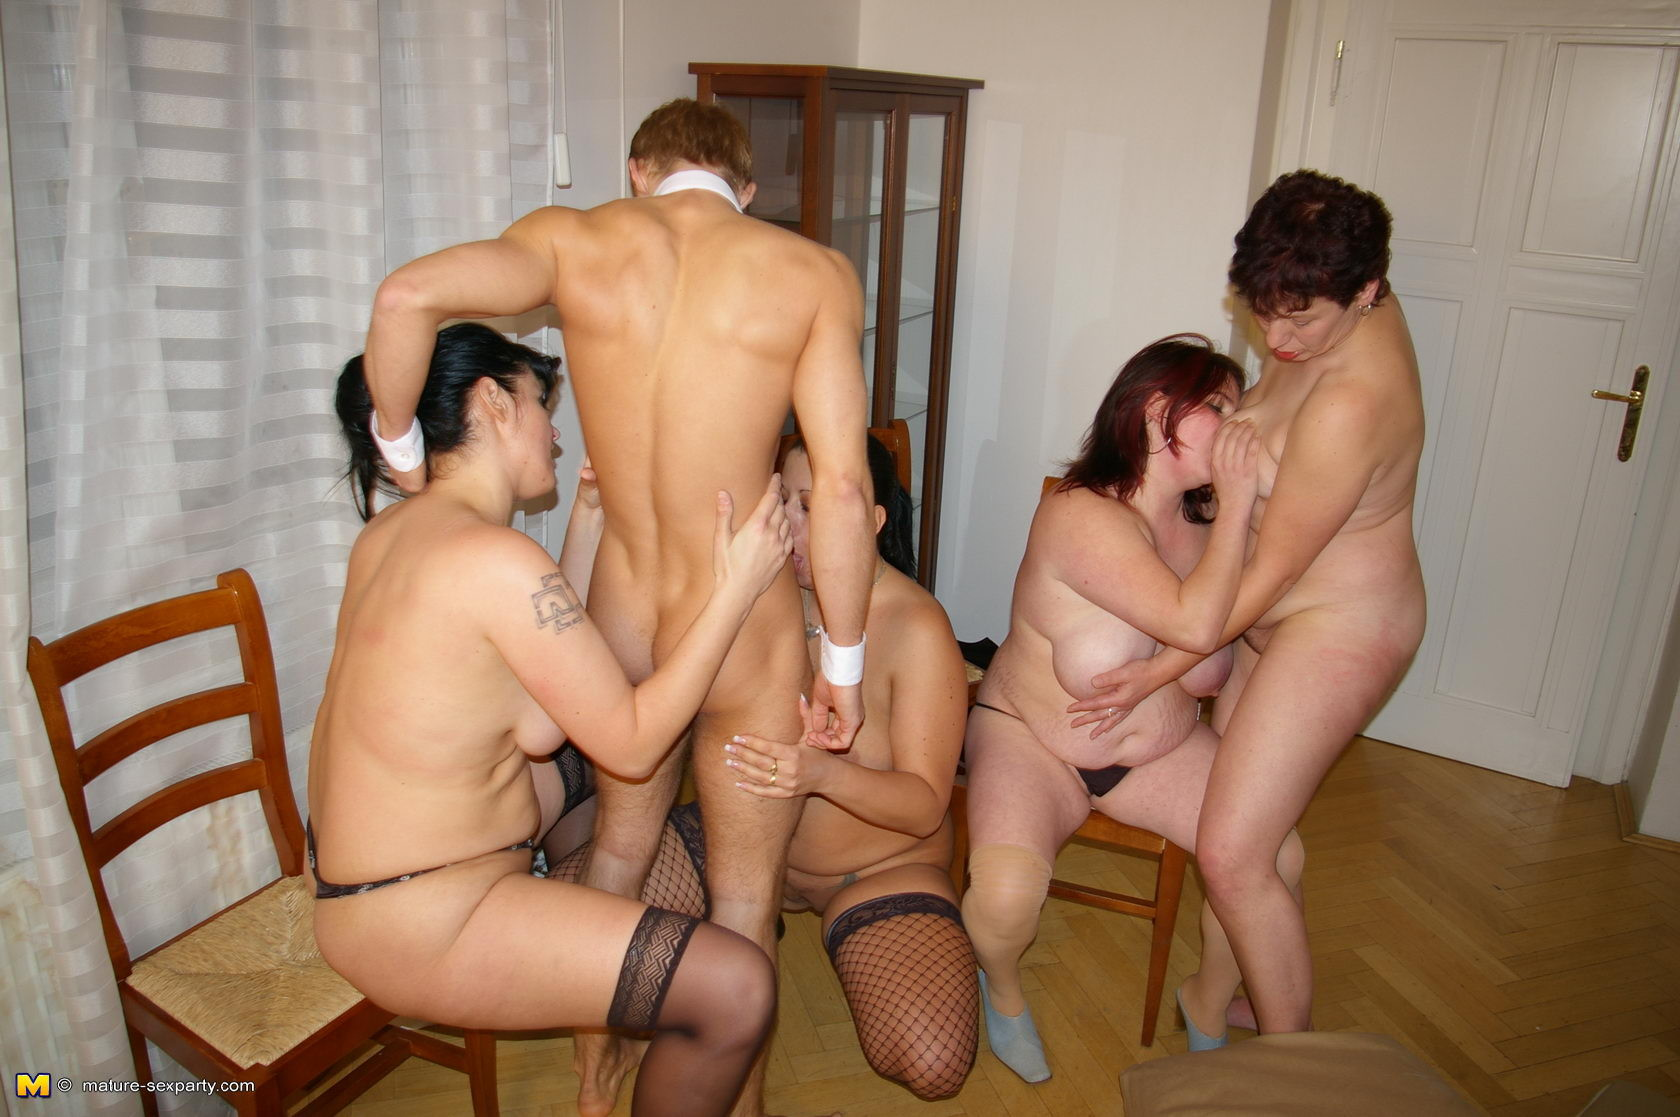 Пышки лезбиянки порно онлайн 18 фотография